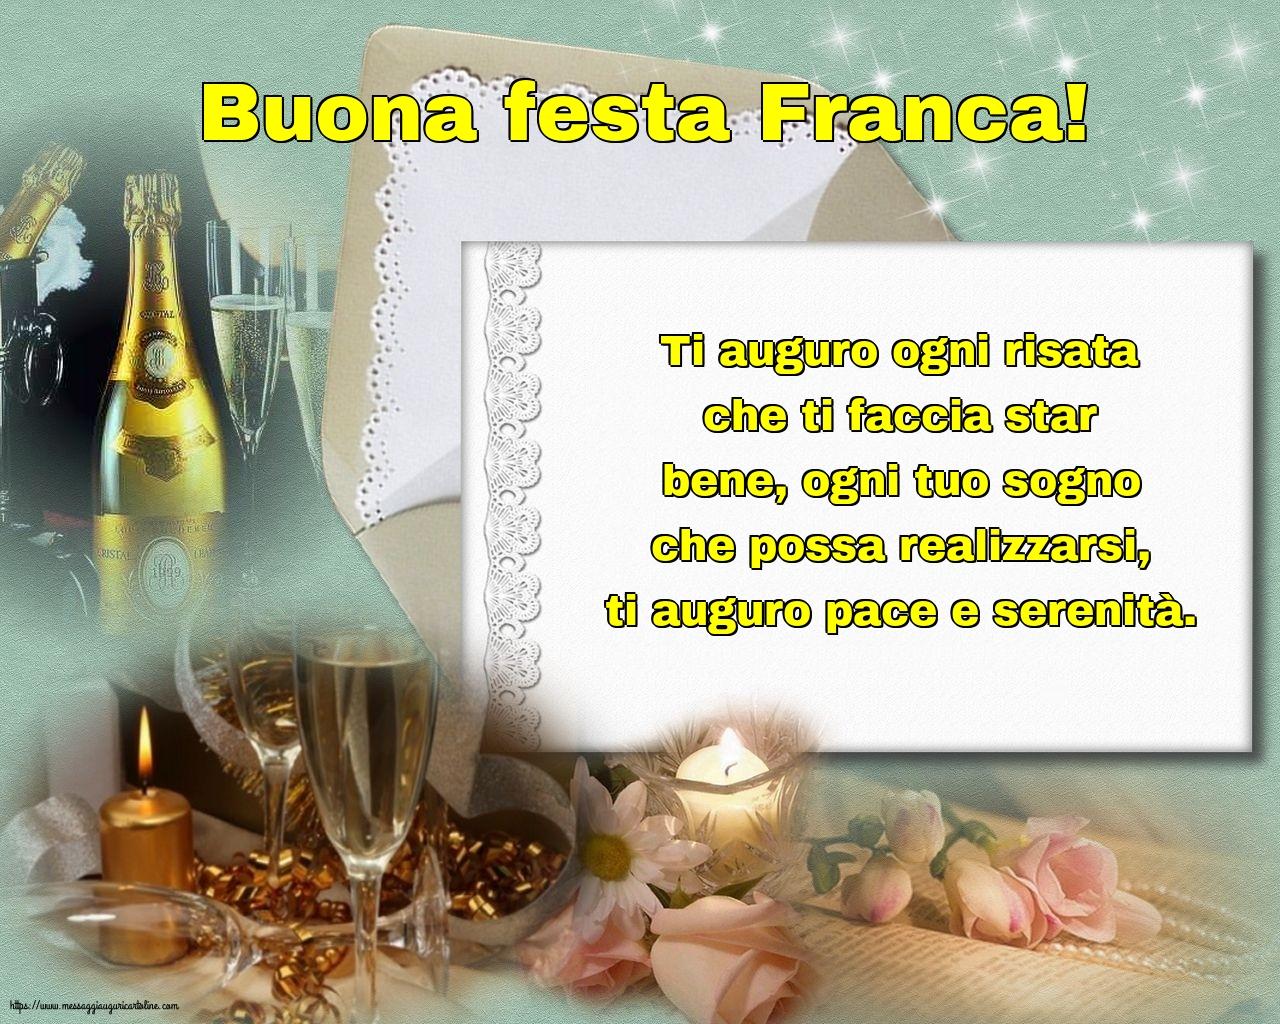 Cartoline di San Francesco - Buona festa Franca!